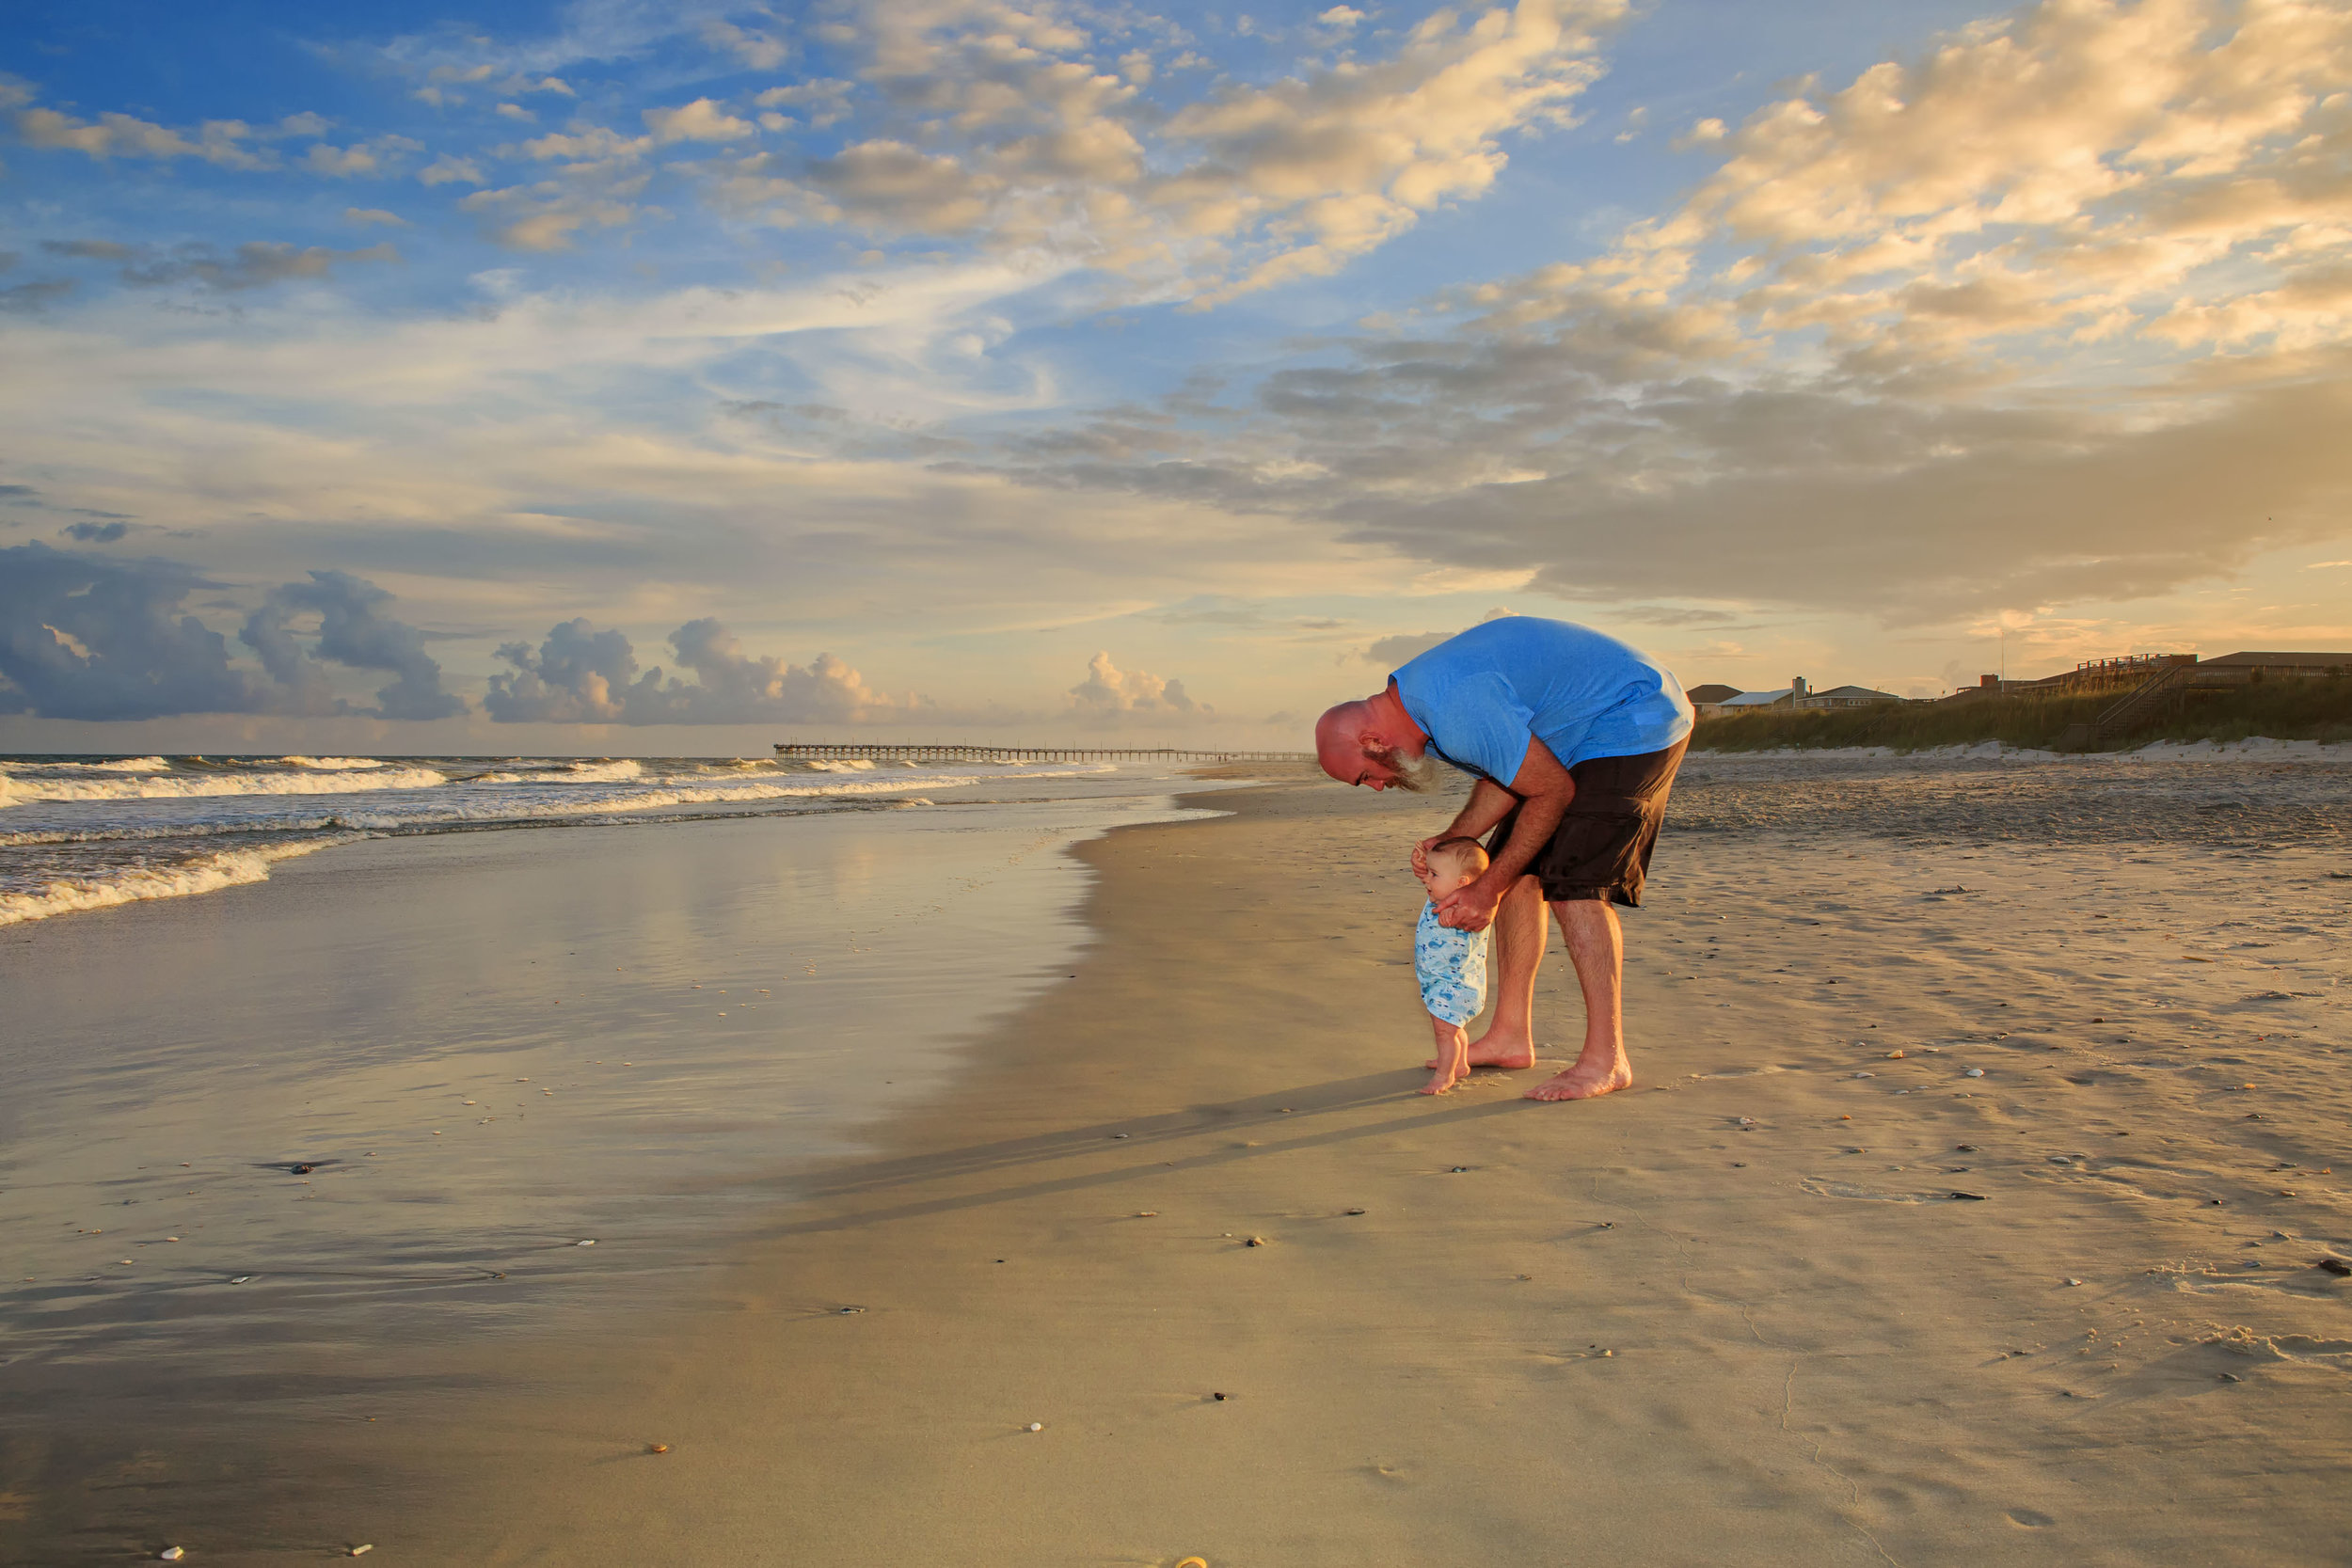 Topsail_Beach_Photographer_Tiffany_Abruzzo_Photography_77.jpg